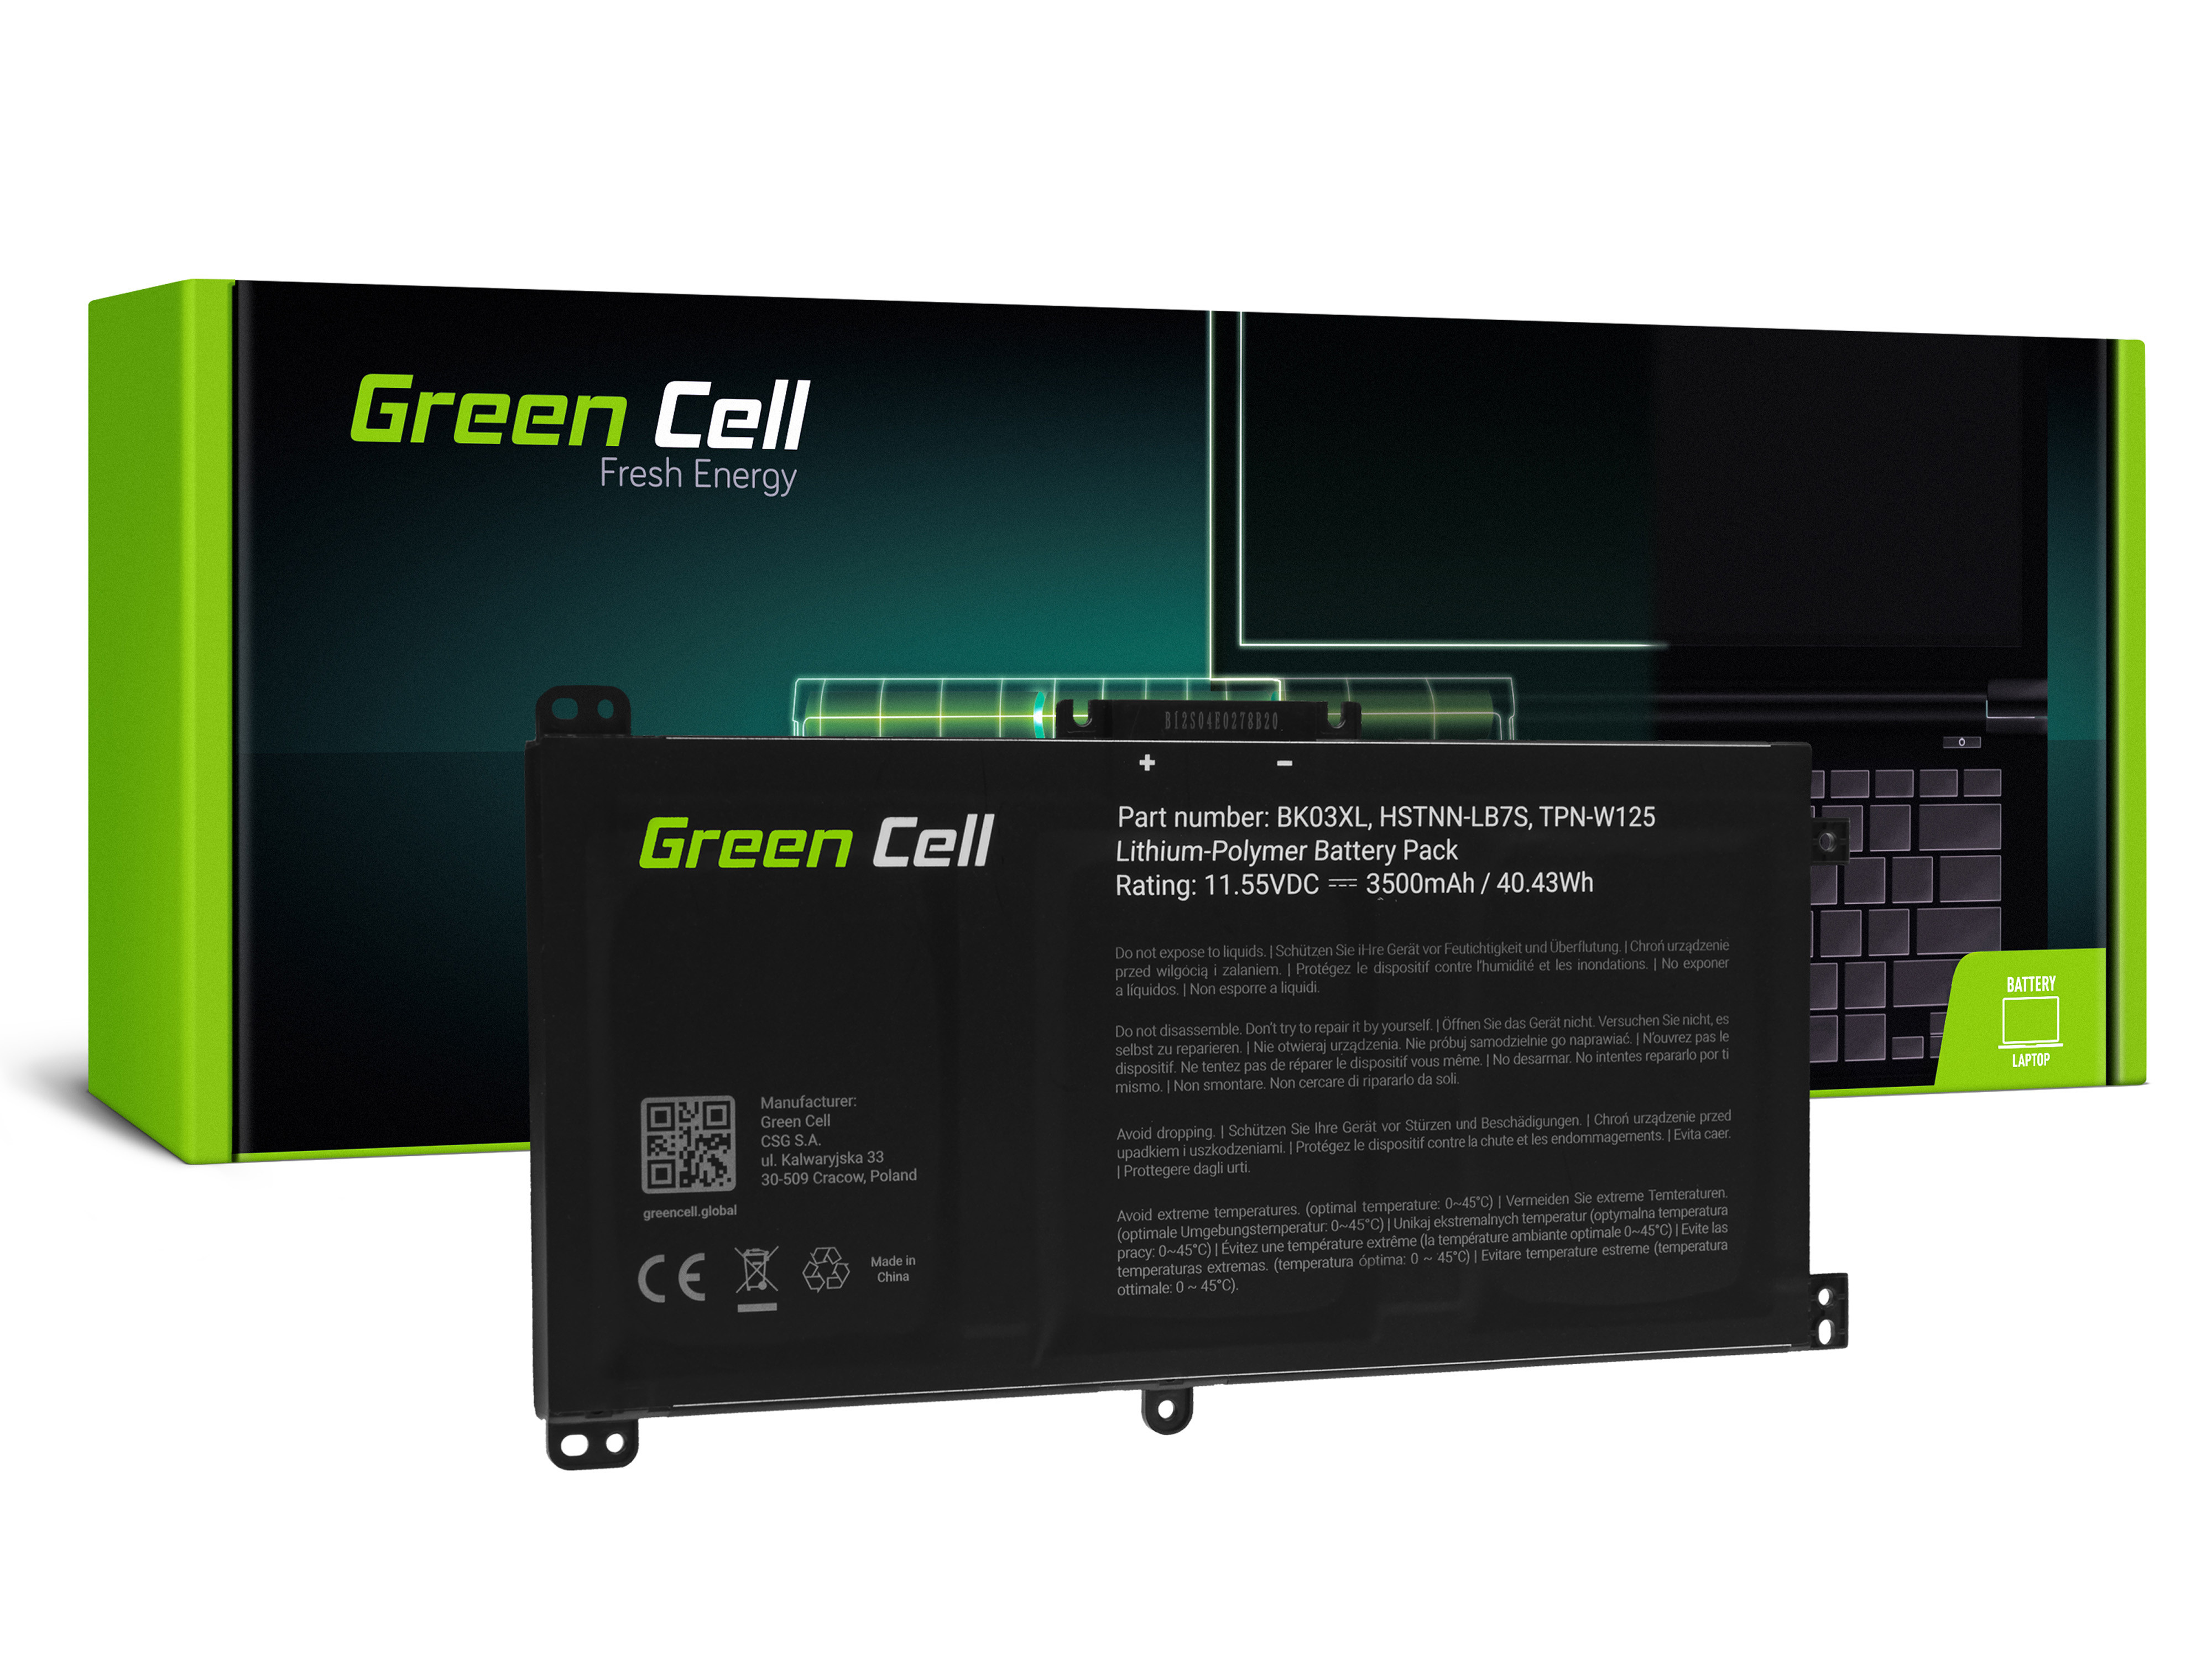 Green Cell HP167 Baterie HP BK03XL HP Pavilion x360 14-BA 14-BA015NW 14-BA022NW 14-BA024NW 14-BA102NW 14-BA104NW 3500mAh Li-Pol – neoriginální